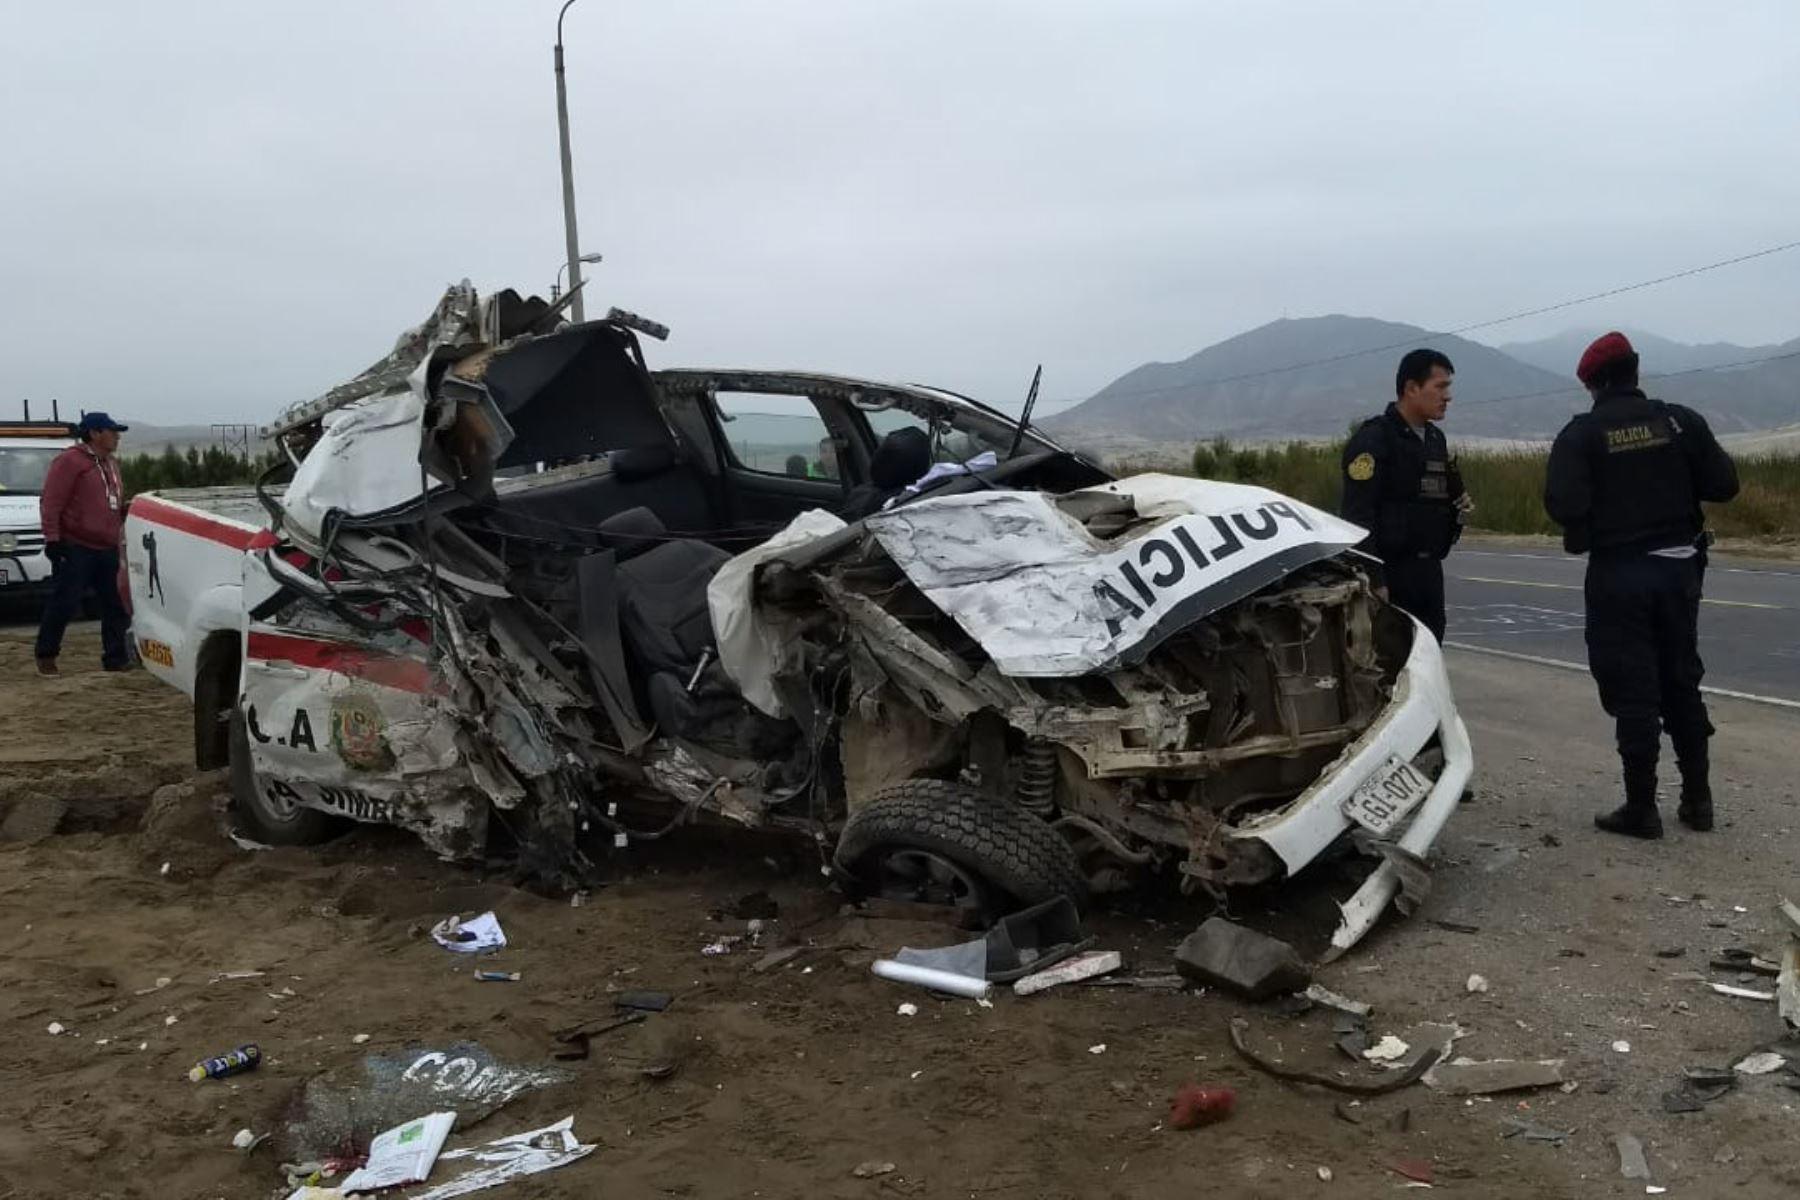 El suboficial de tercera de la PNP Camilo Montañez Ulloa falleció en el choque que protagonizó un bus interprovincial y un patrullero. Foto: ANDINA/Gonzalo Horna